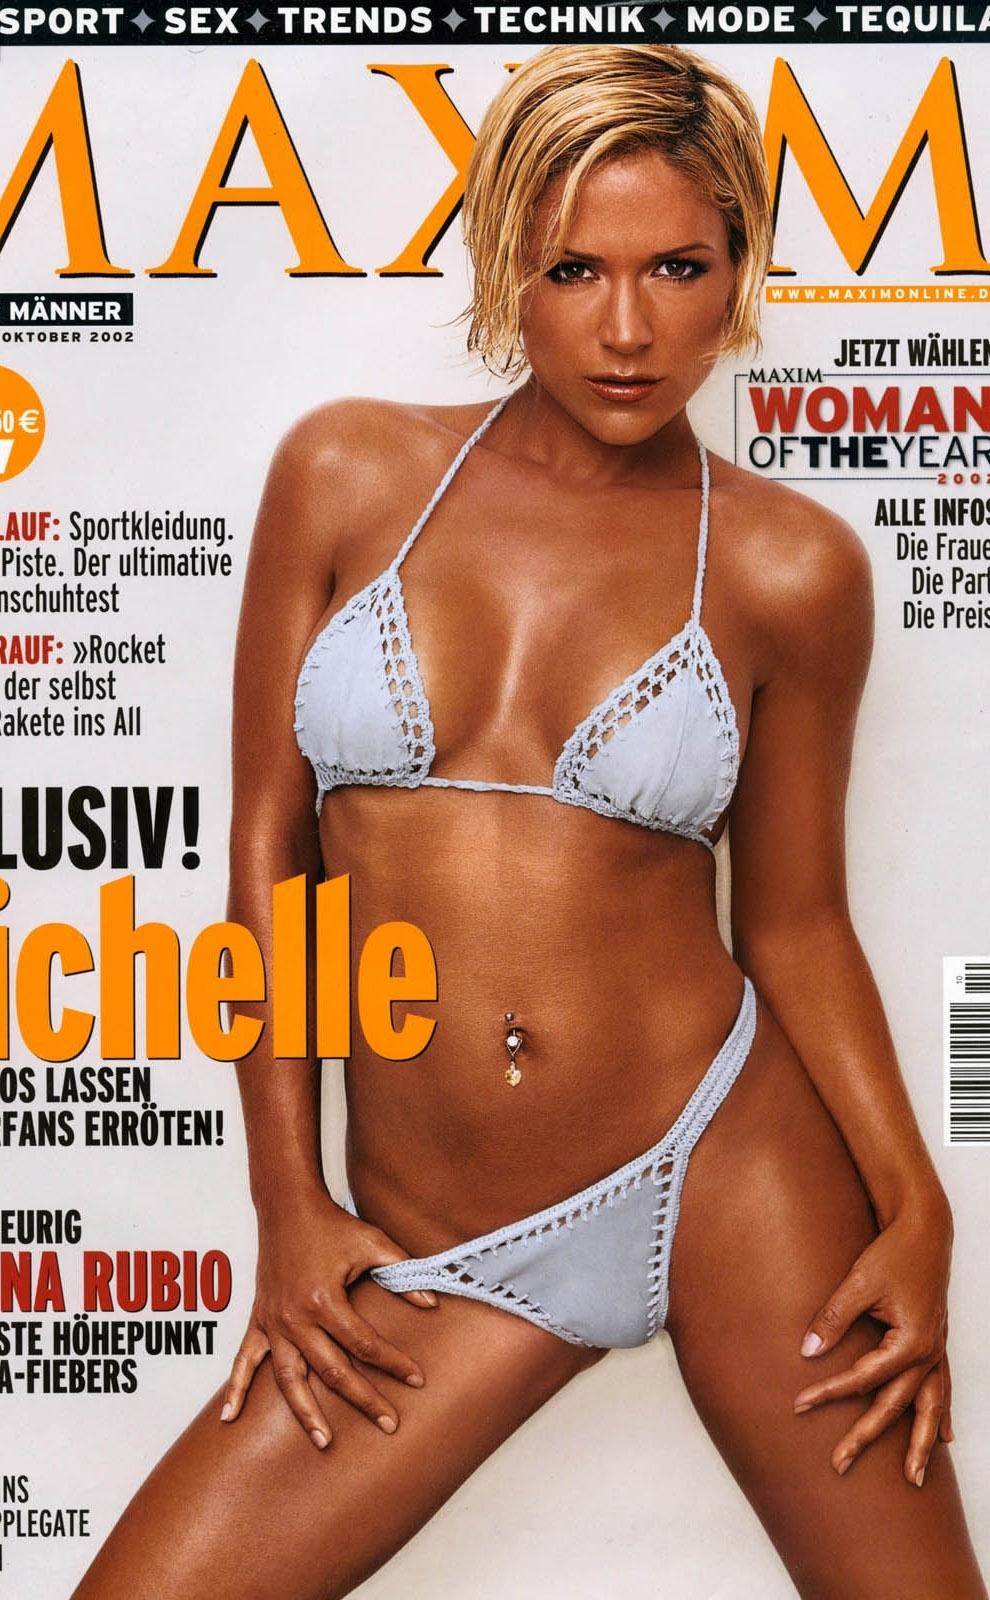 Мишель (Таня Хьюер) голая. Фото - 42